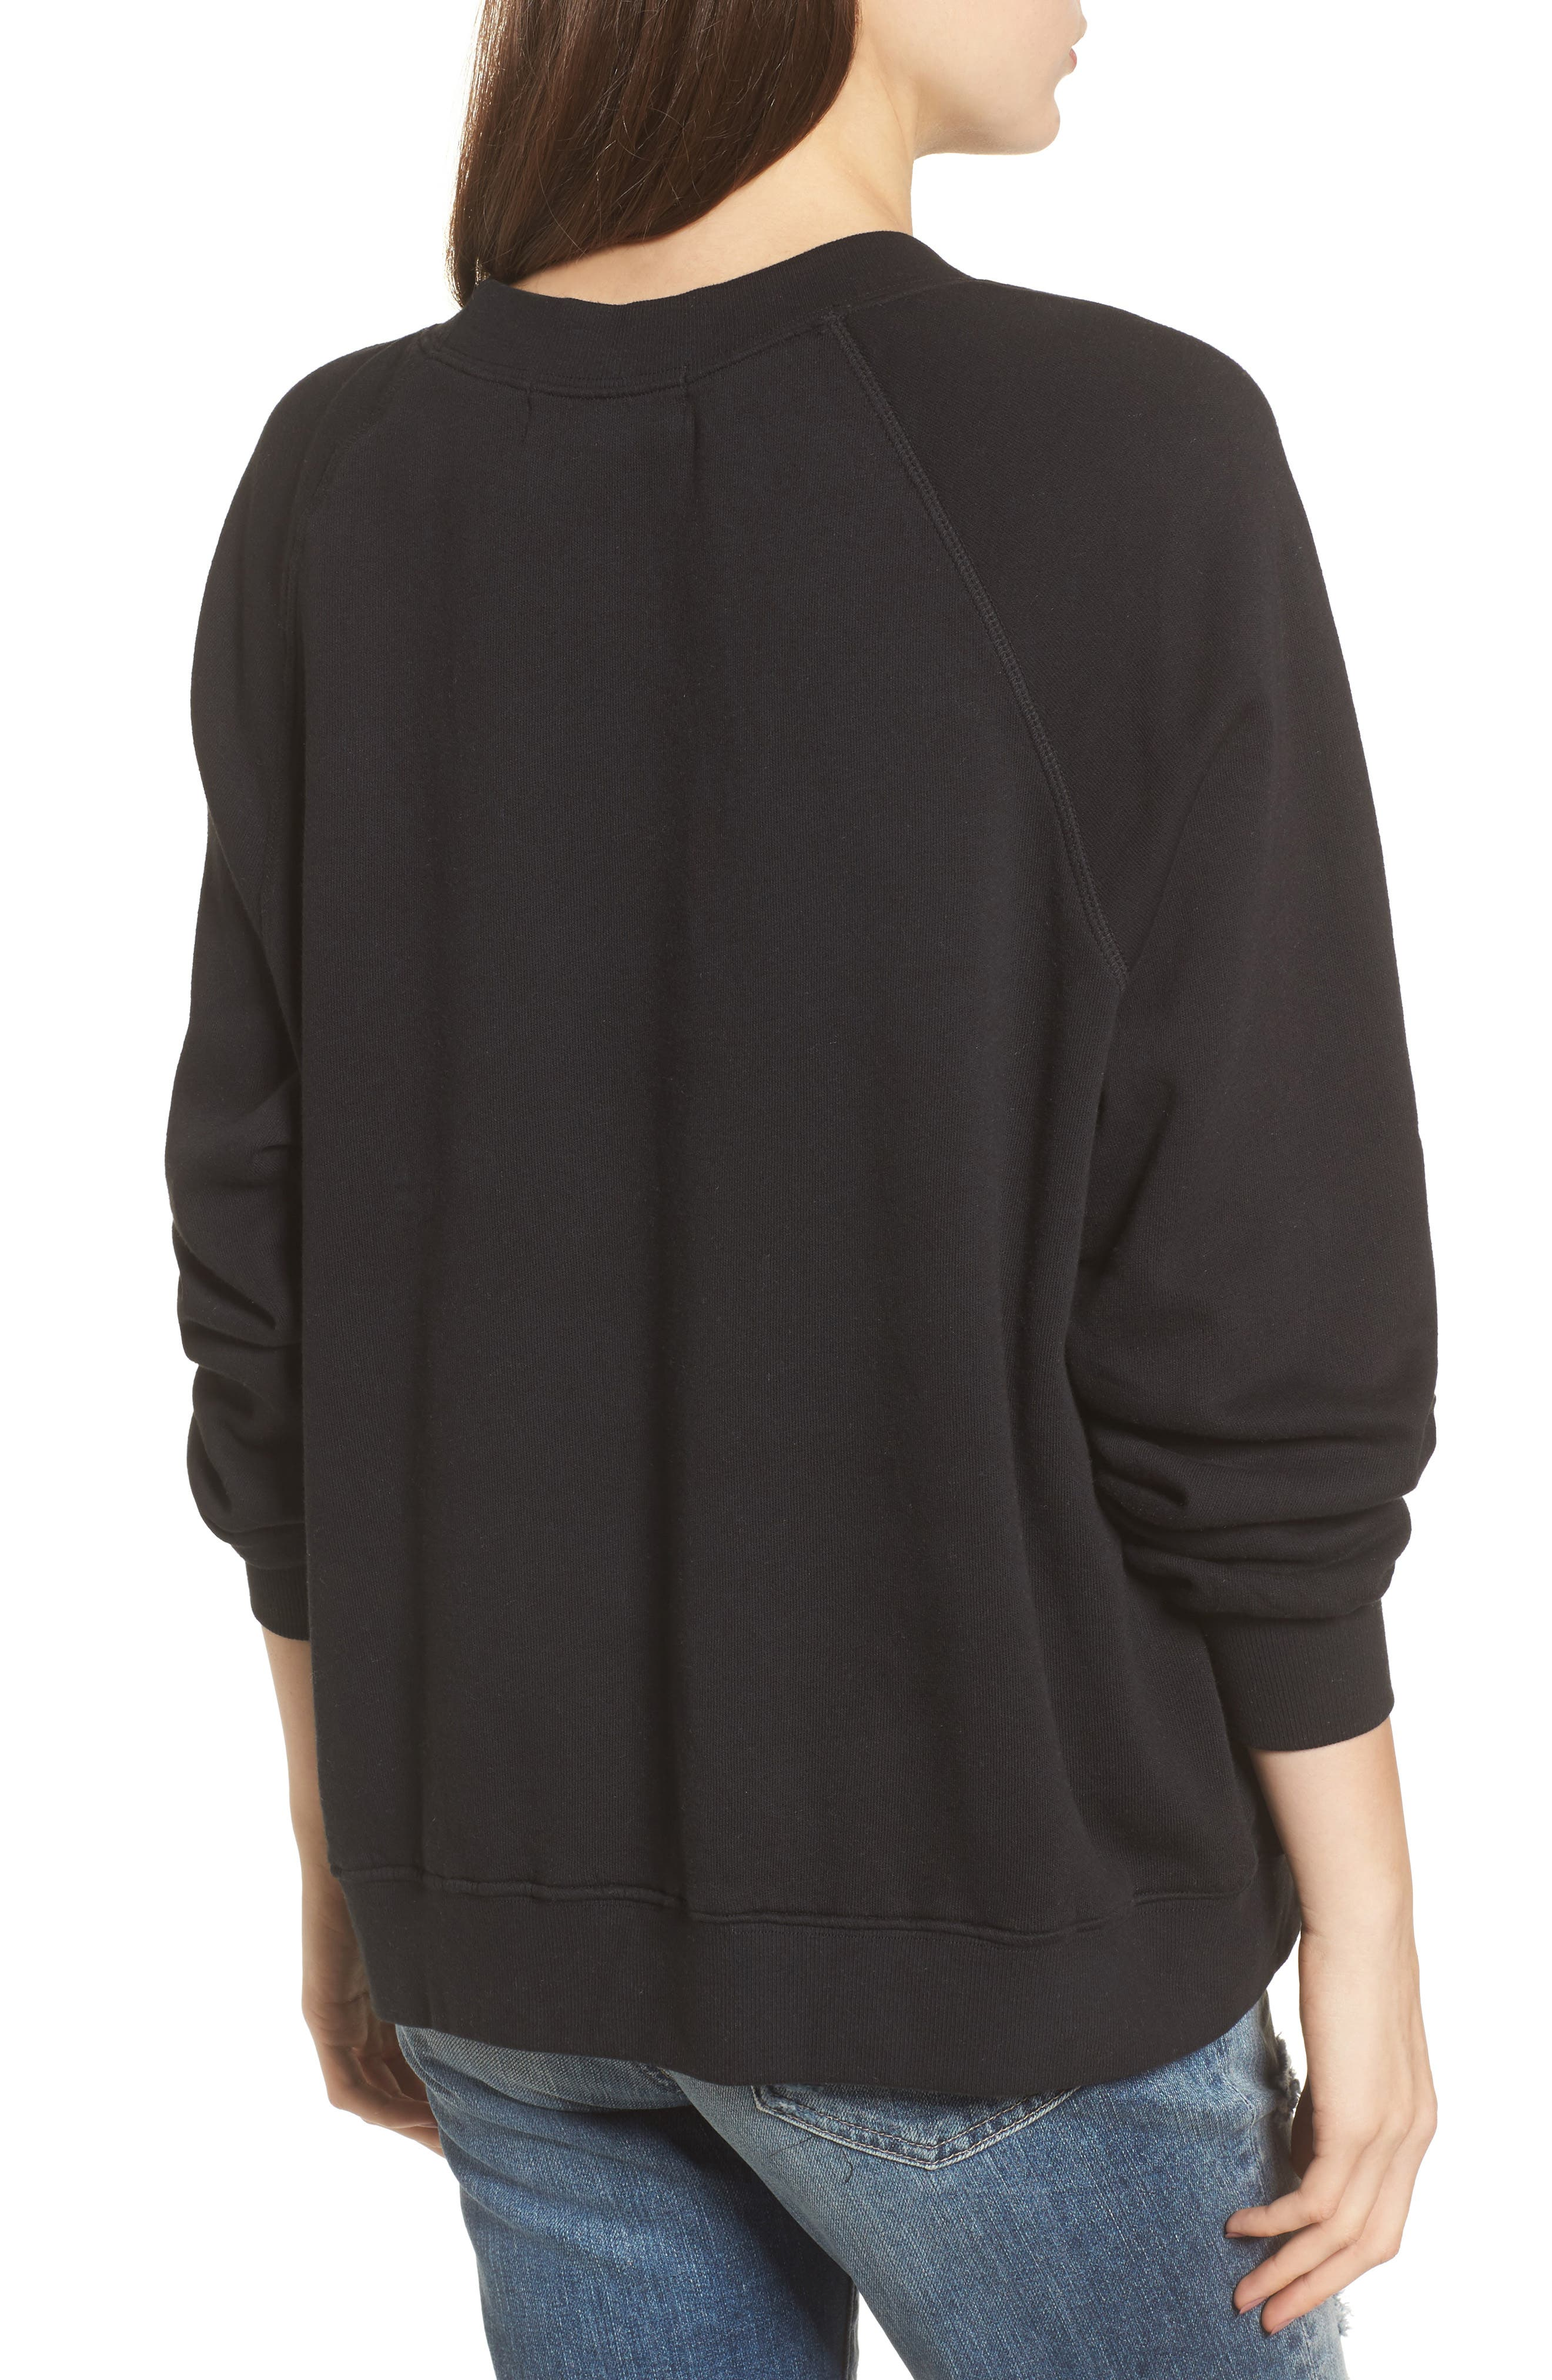 Wino - Sommers Sweatshirt,                             Alternate thumbnail 2, color,                             Black